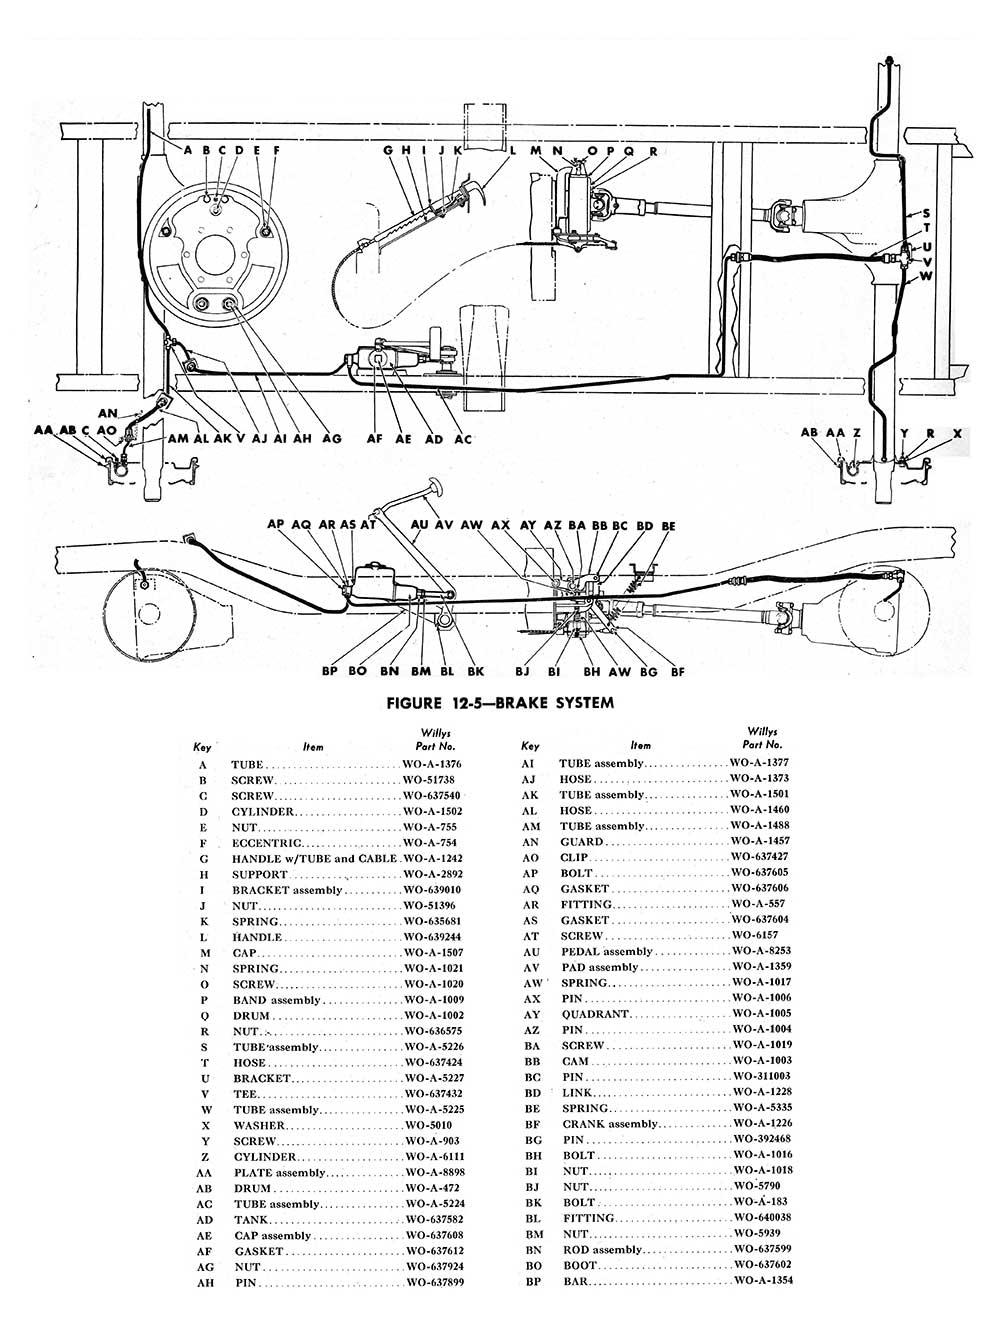 Jeepster Engine Wiring Diagram. Diagram. Auto Wiring Diagram